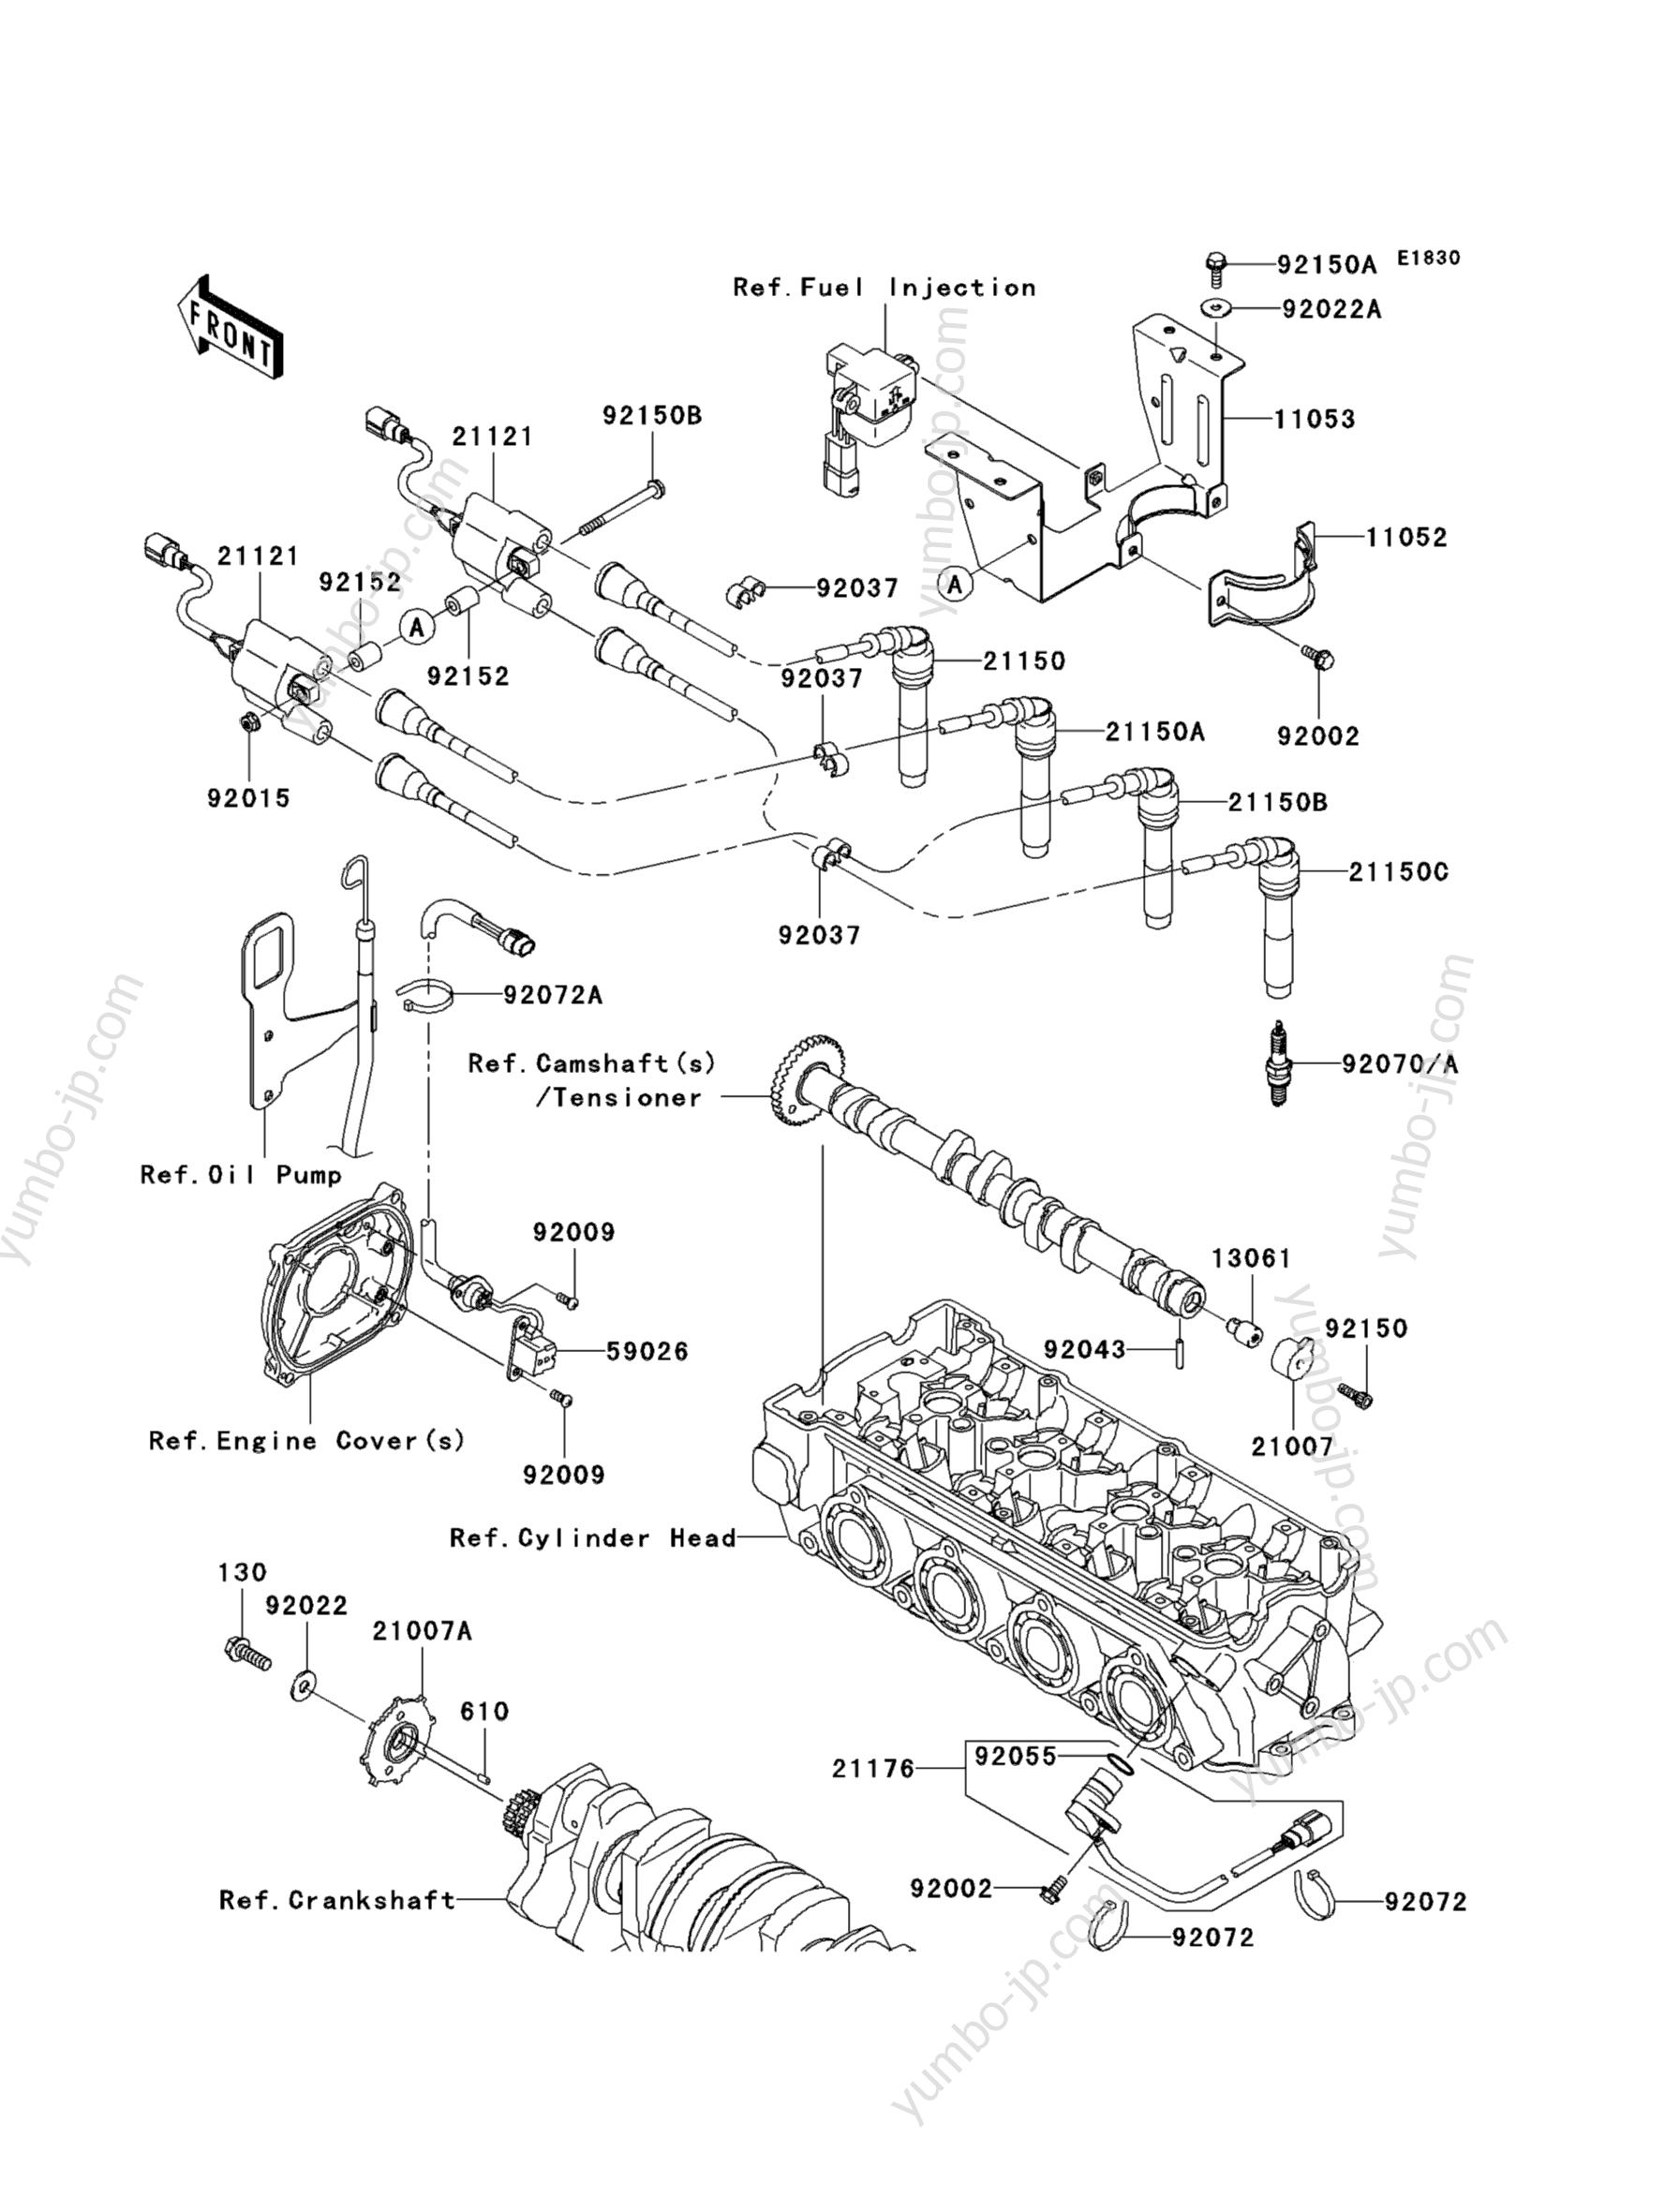 IGNITION SYSTEM для гидроцикла KAWASAKI JET SKI STX (JT1500D9F) 2009 г.